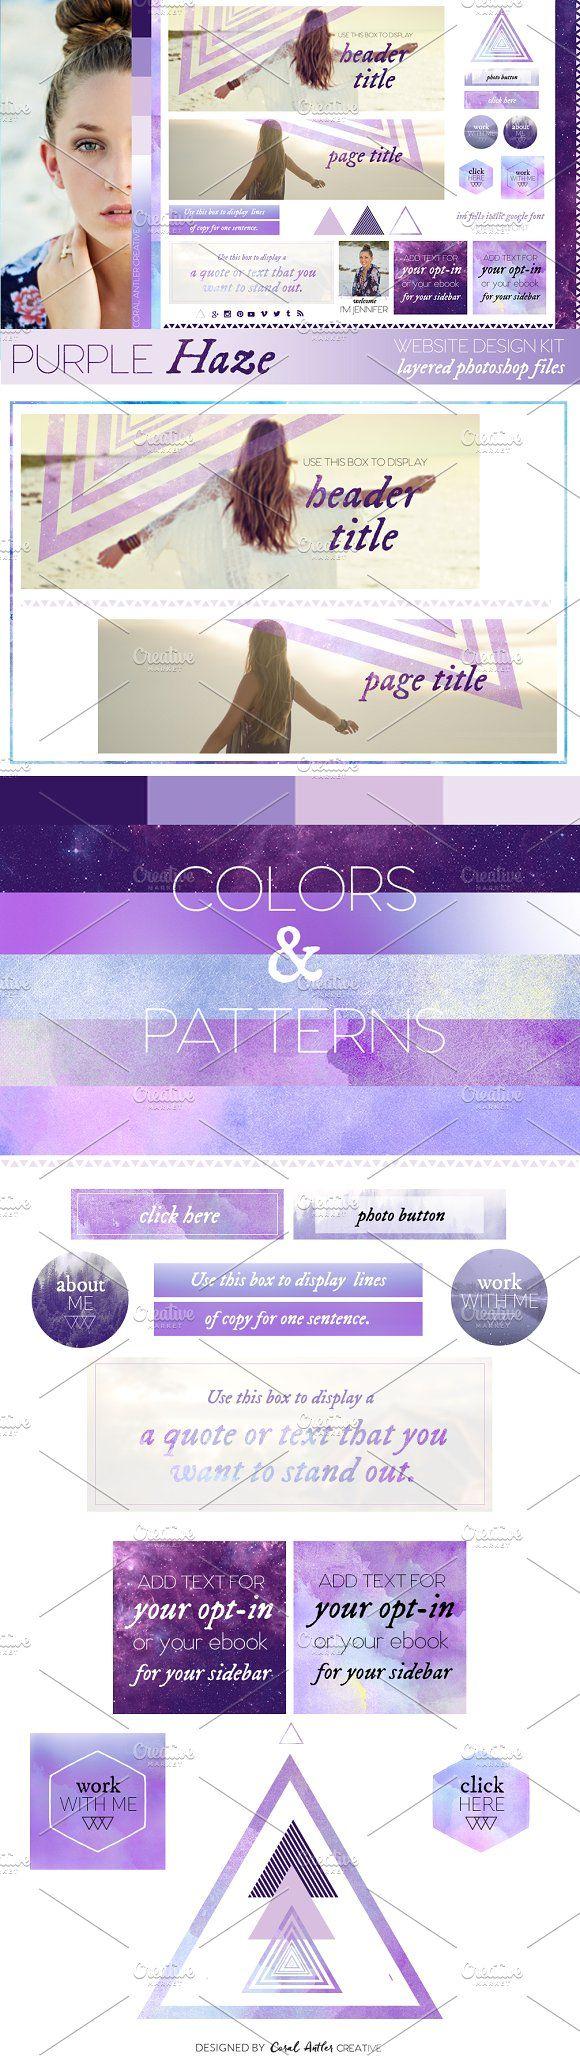 22 best WEBSITE TEMPLATES images on Pinterest | Website template ...